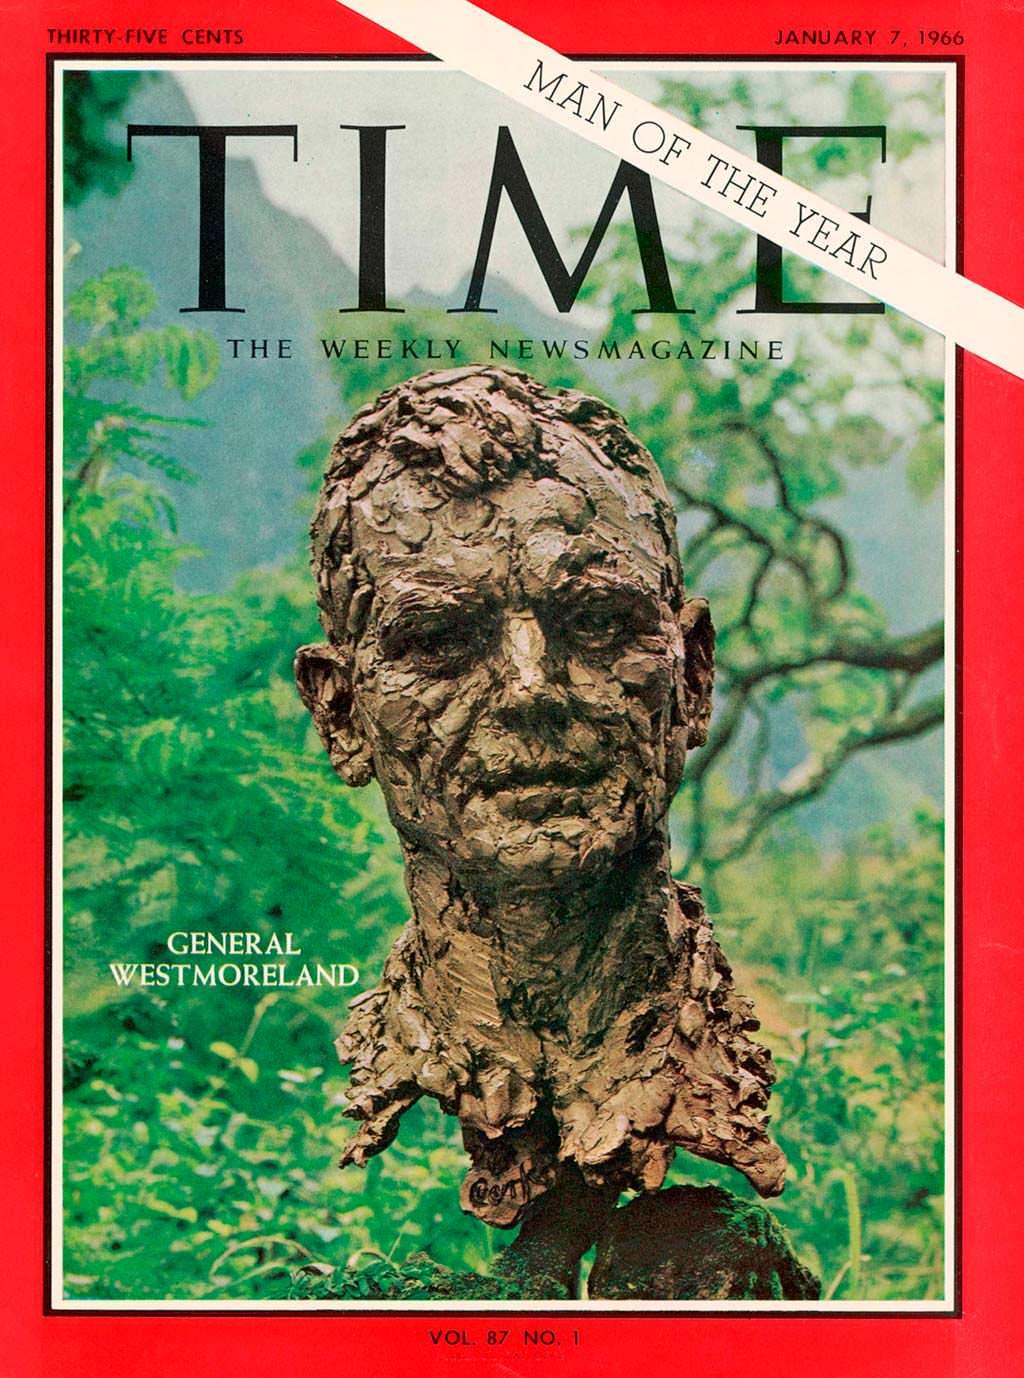 1965 год. Генерал США Уильям Уэстморленд на обложке Time